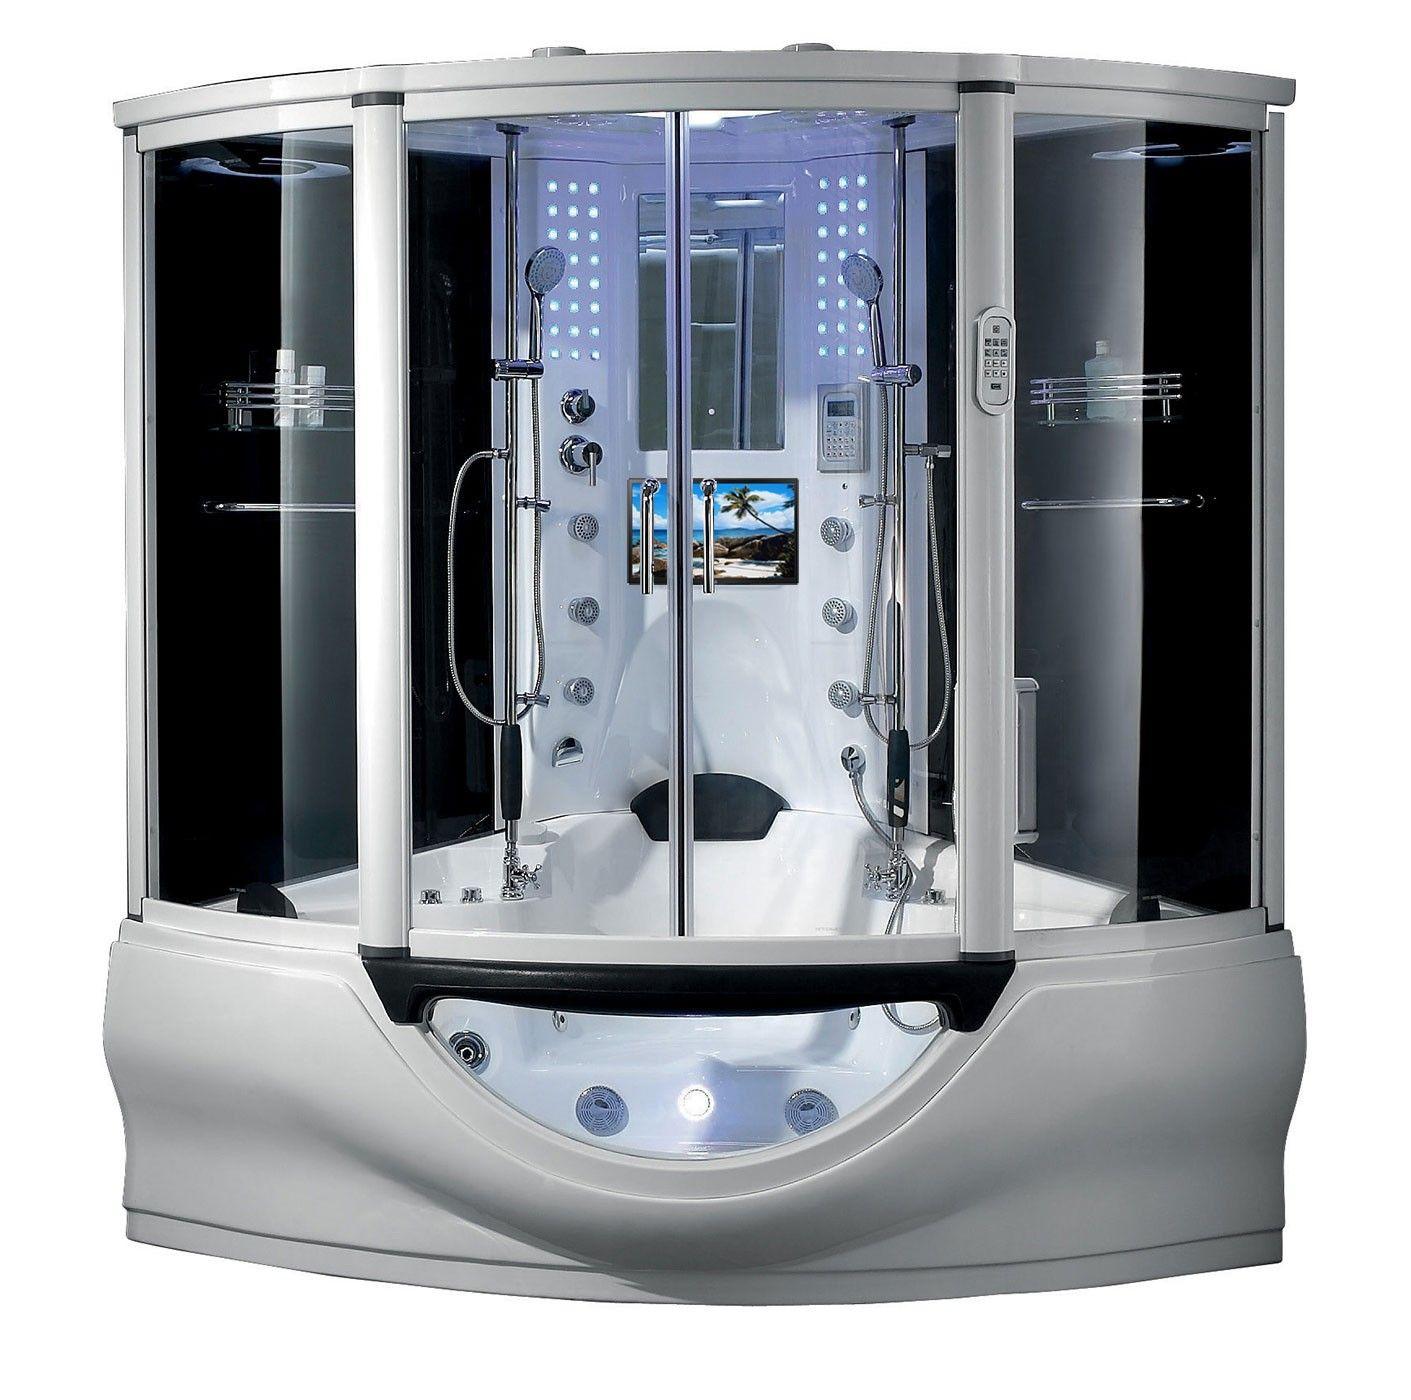 Luxury Bathroom Steam Shower Whirlpool Bathtub With Images